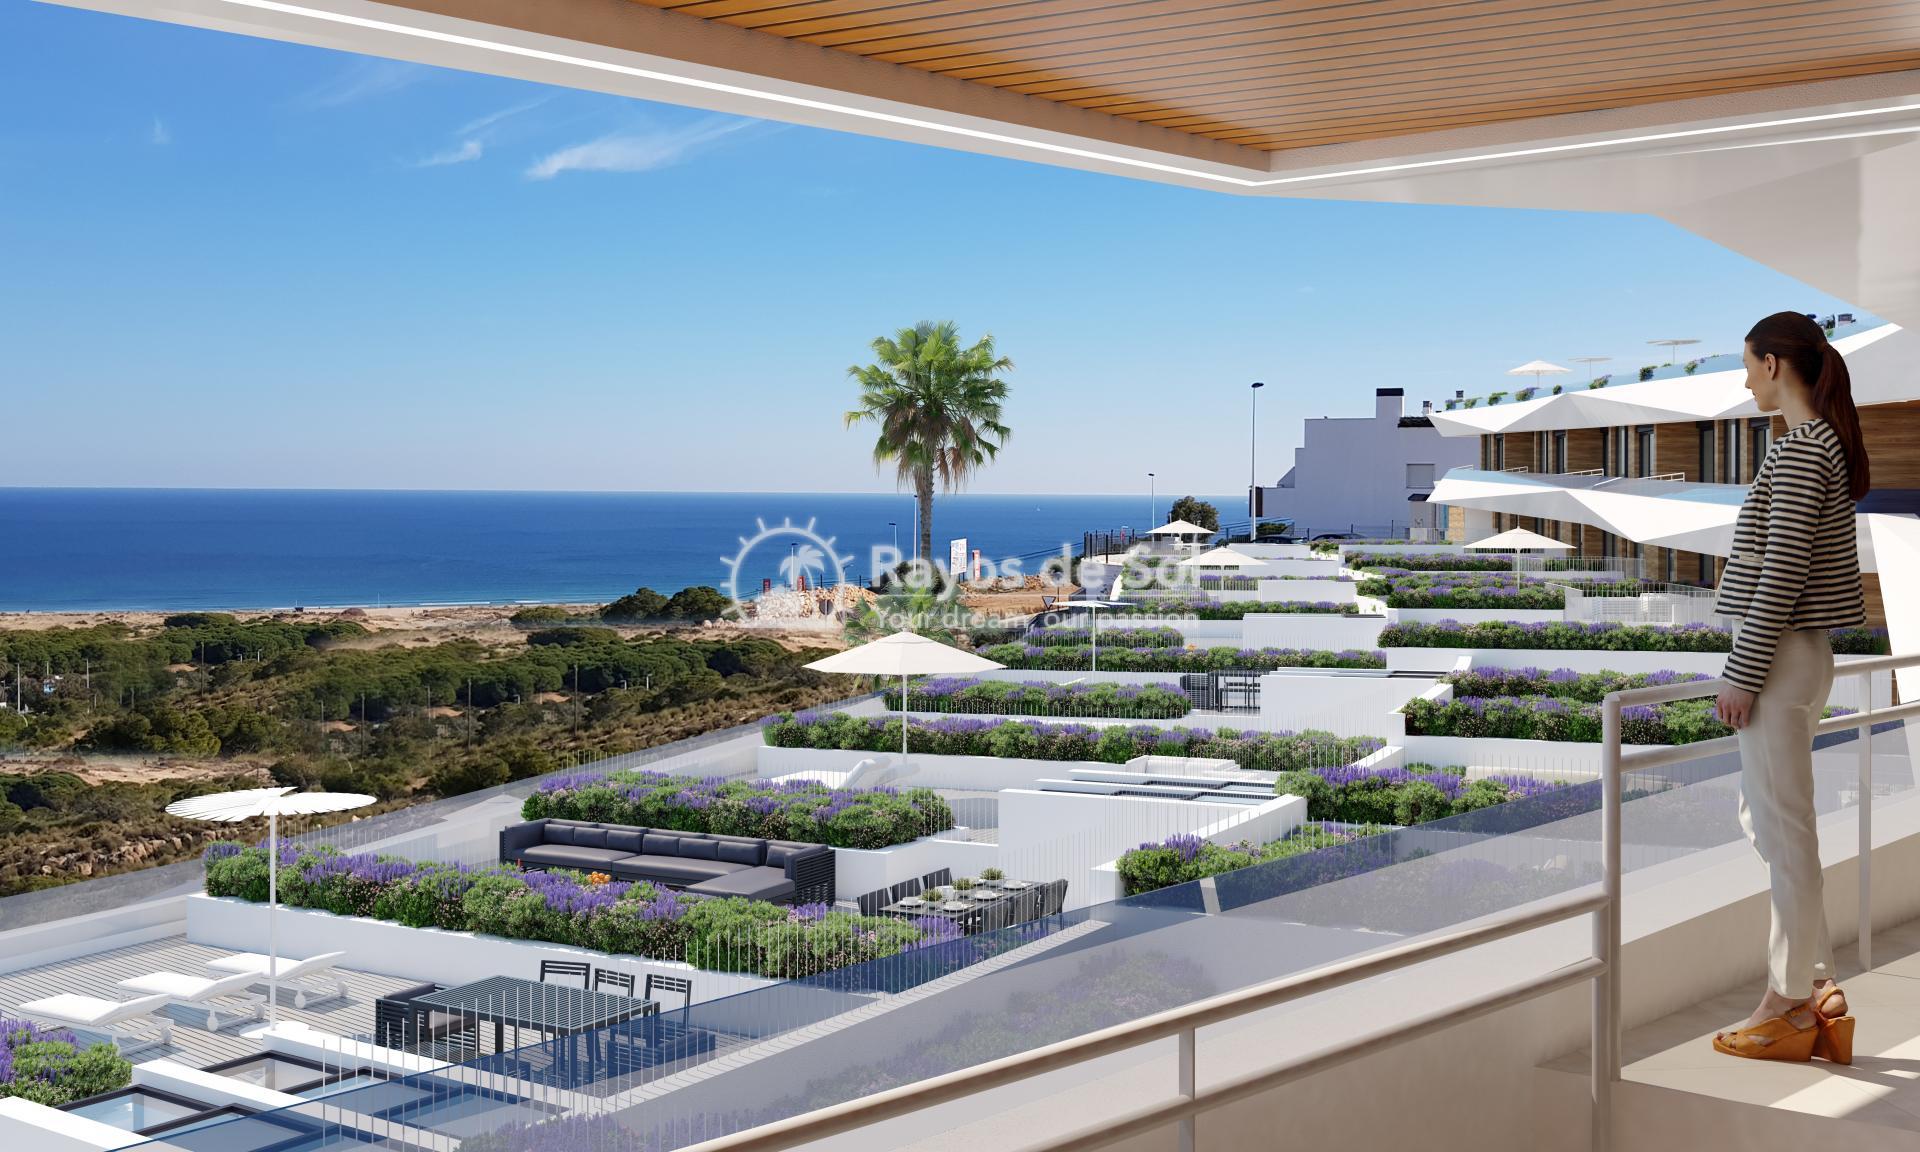 Apartment with seaviews  in Santa Pola, Costa Blanca (Aura apt2d) - 13